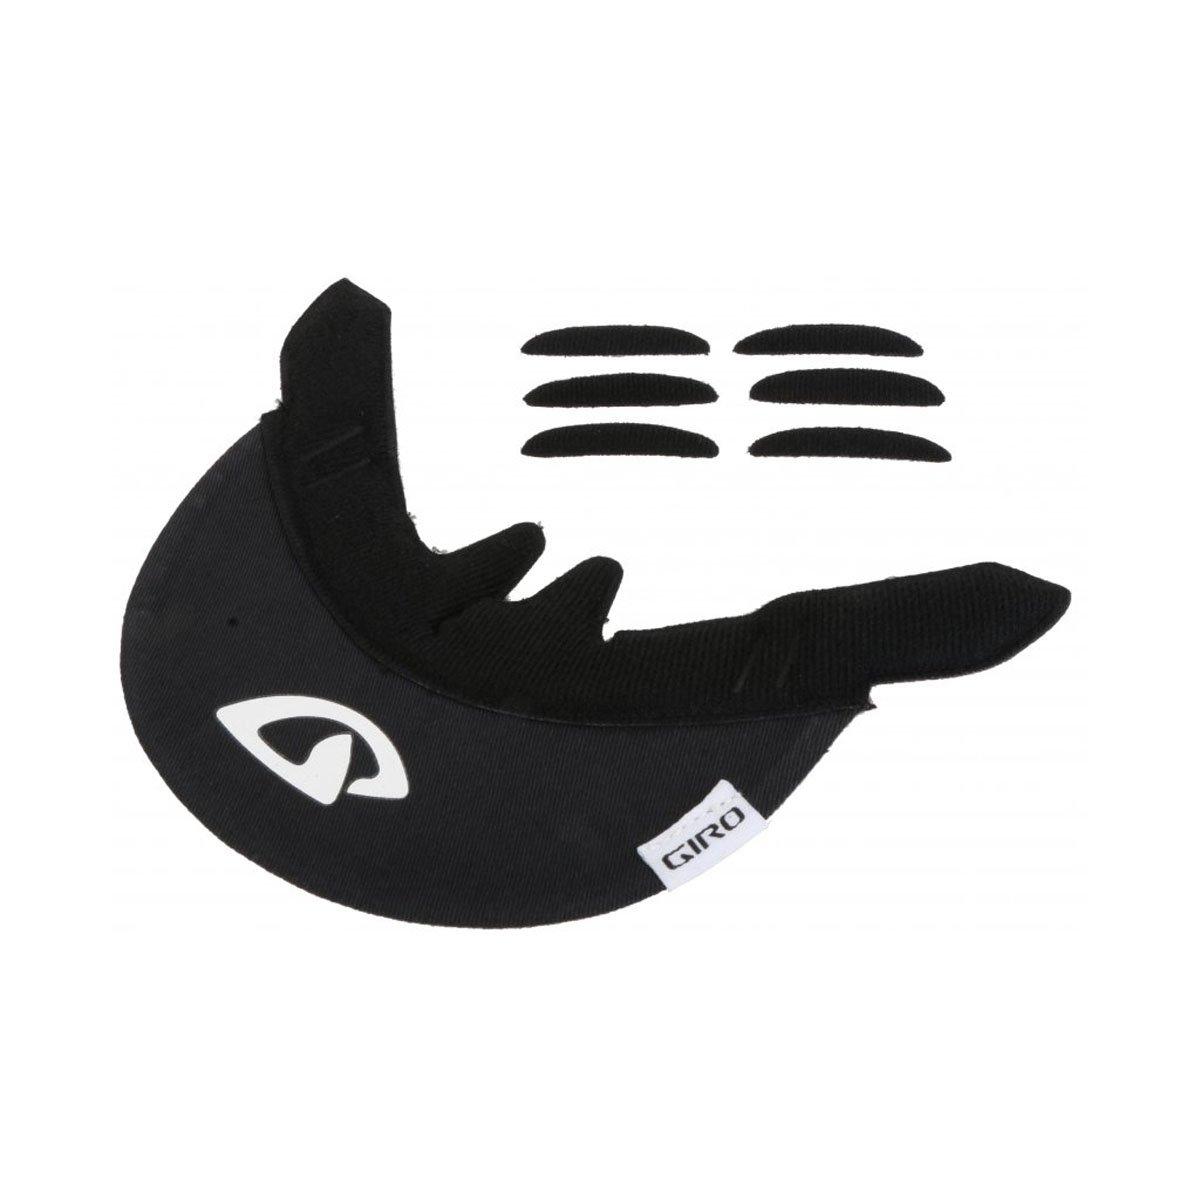 Giro Bicycle Helmet Replacement Cloth Visor (Black)